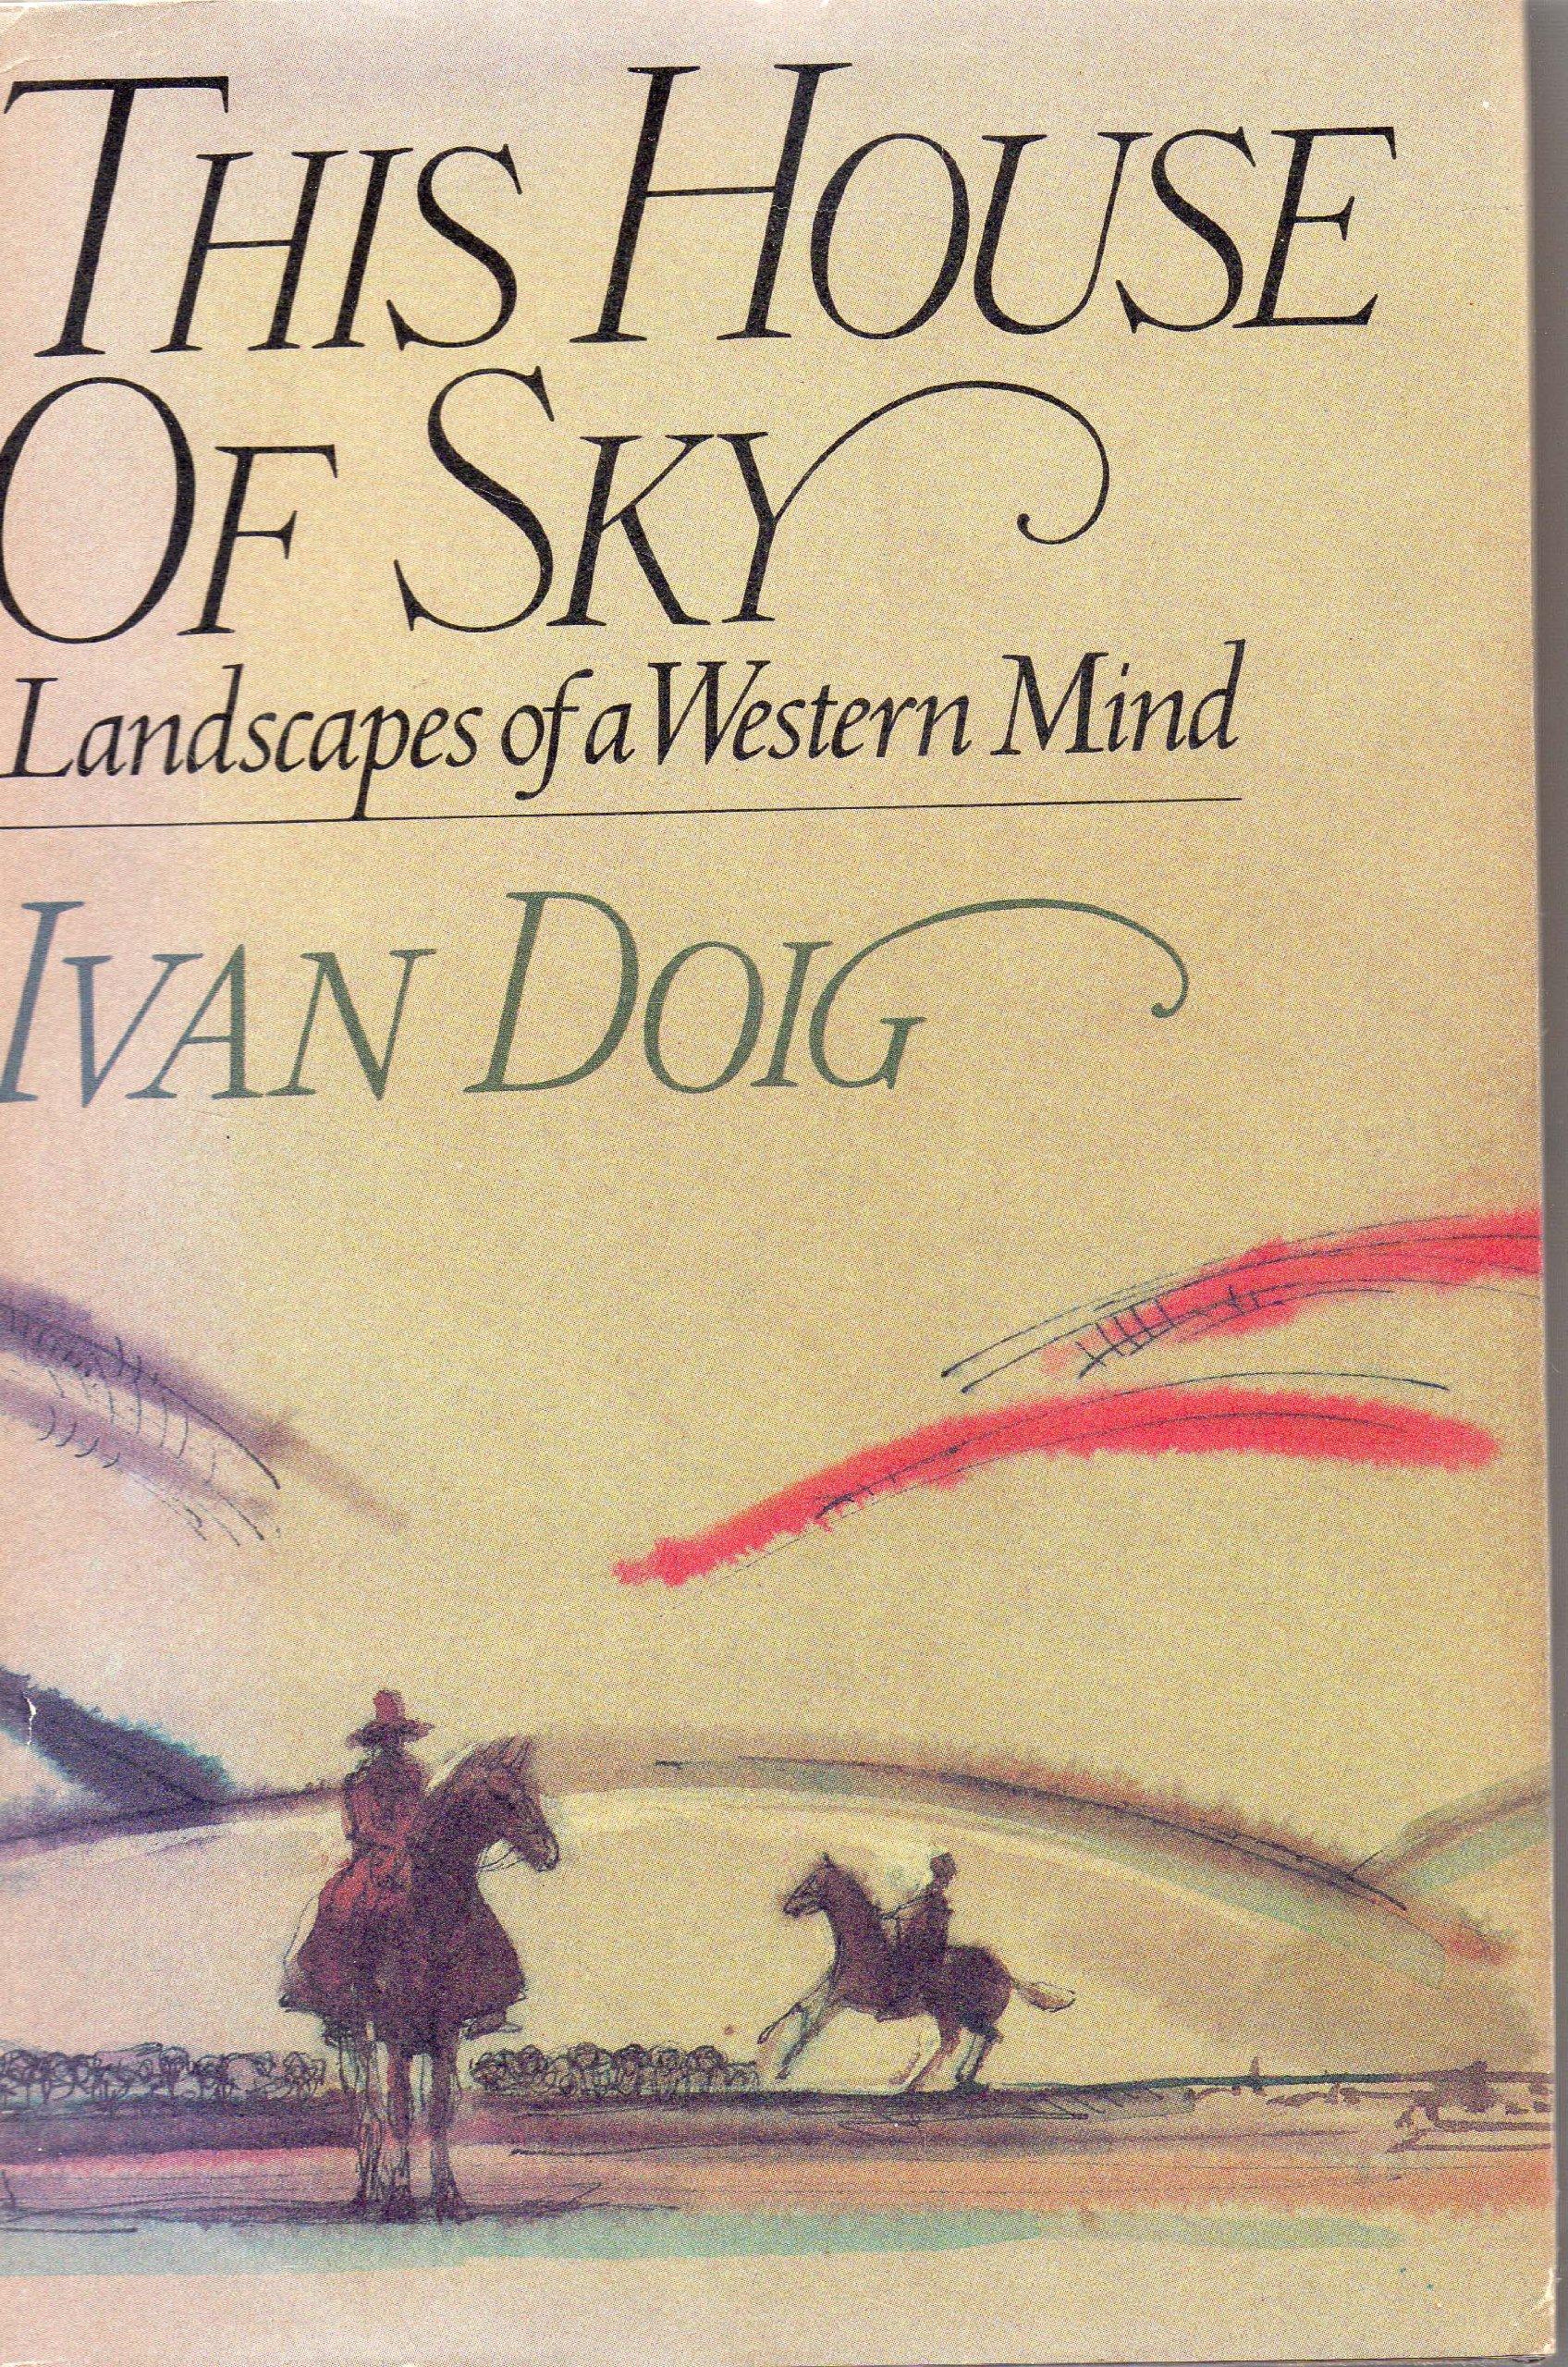 This house of sky: Landscapes of a Western mind by Harcourt Brace Jovanovich